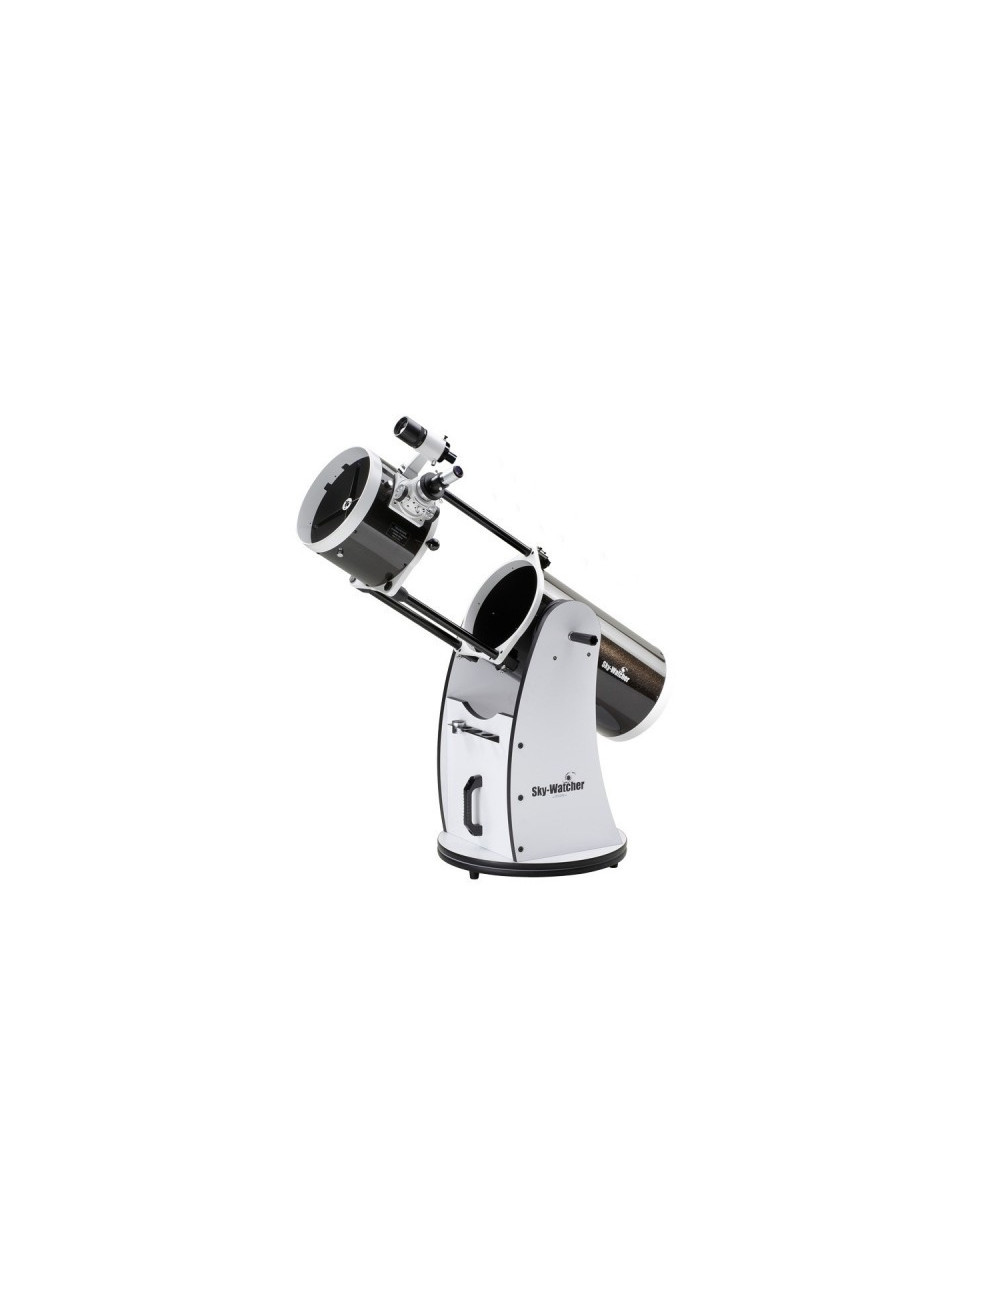 Telescope Dobson FlexTube 250/1200 Sky-Watcher